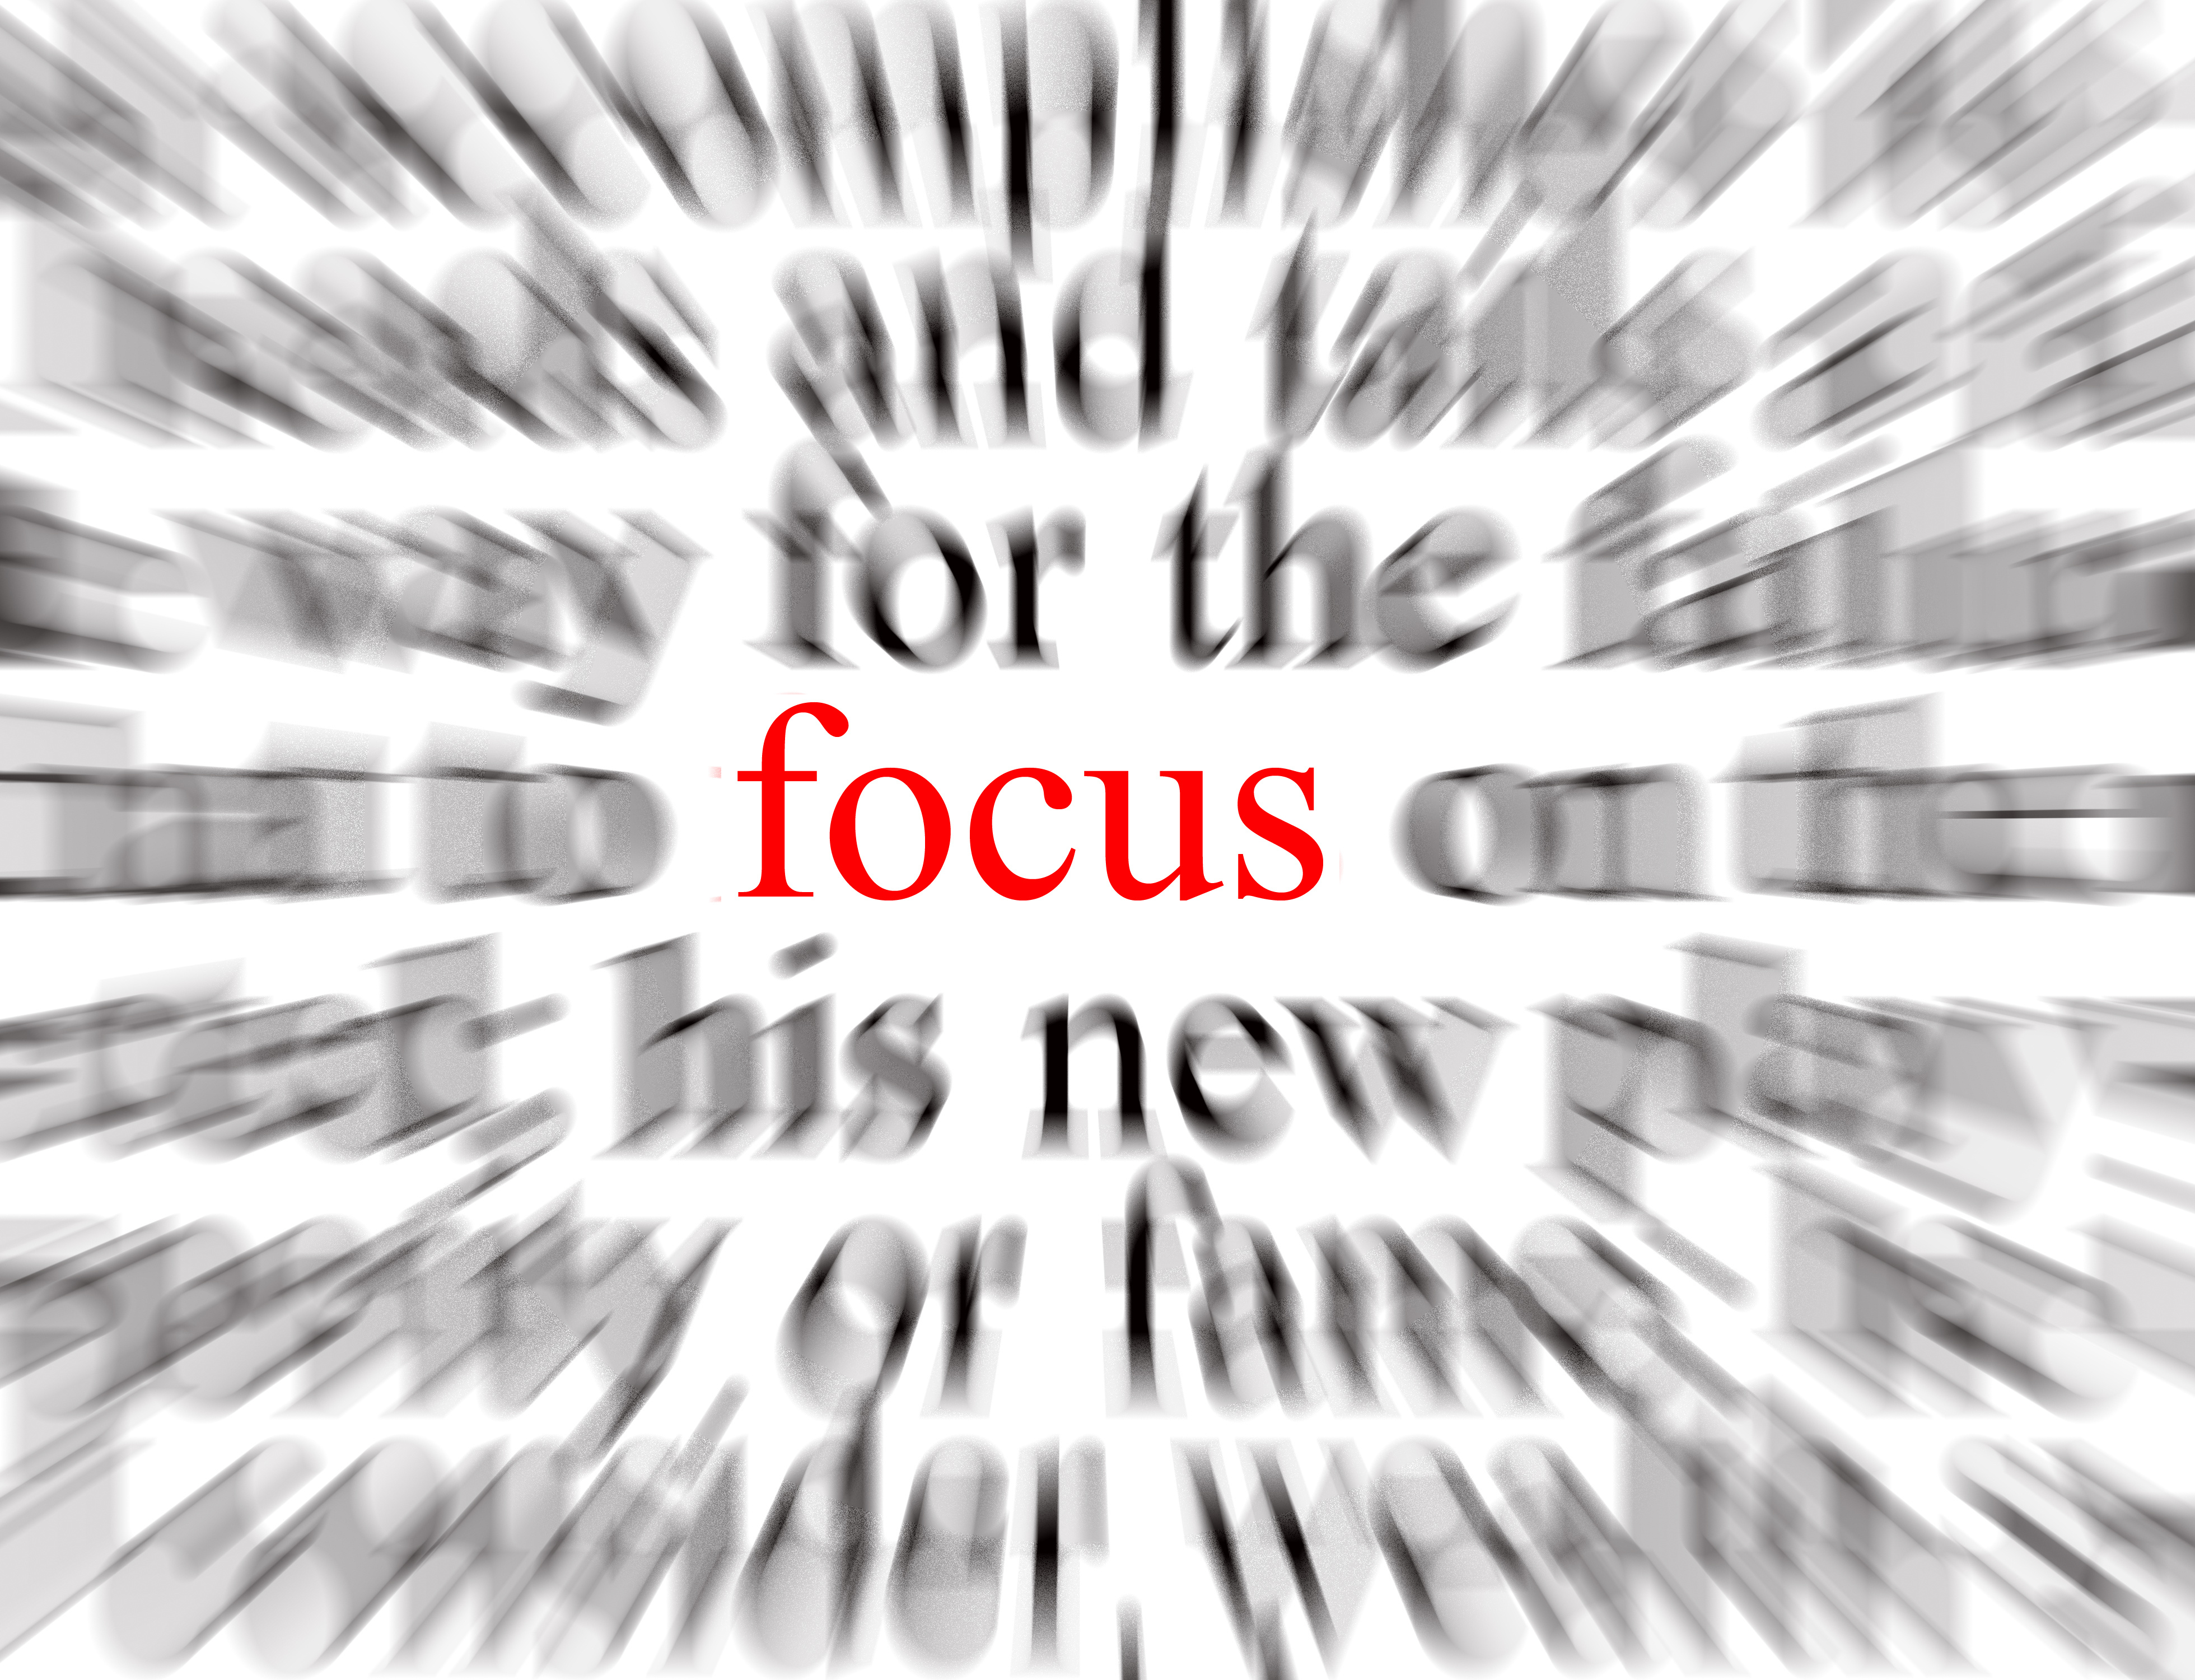 why mission brings focus manhood leadership and discipleship rh dennissy com focus nachrichten focus money